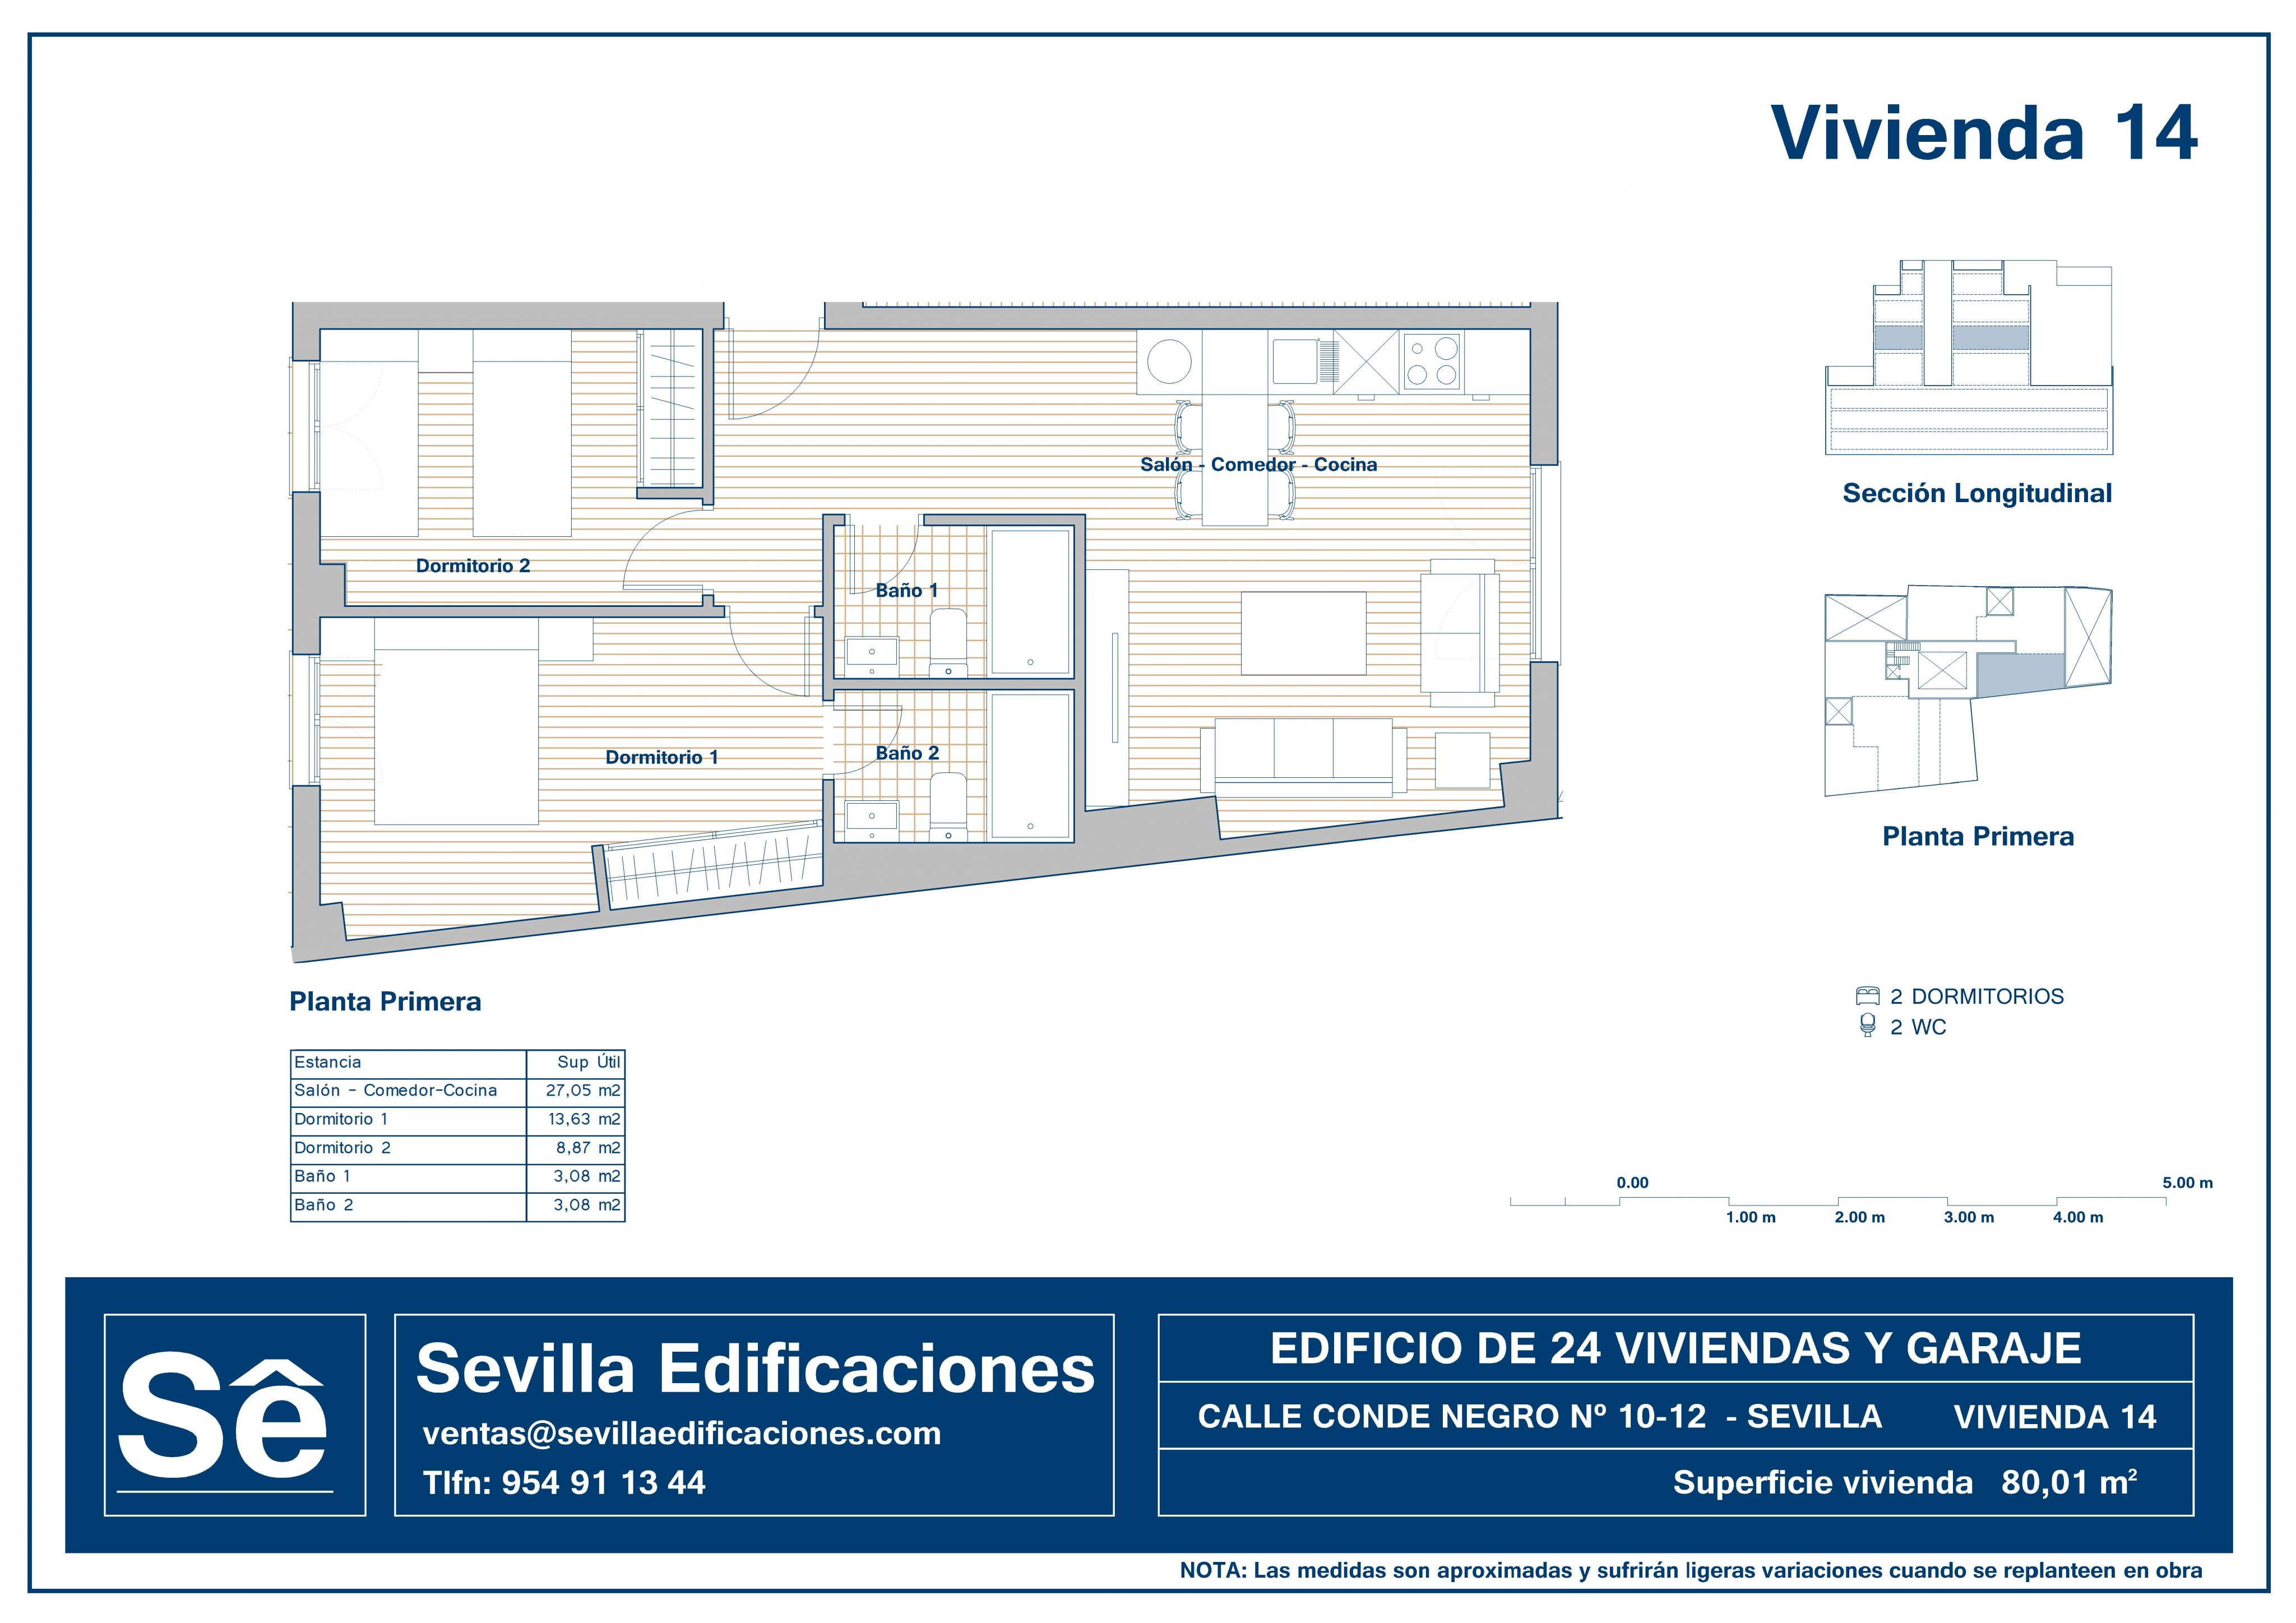 CONDENEGRO_VIVIENDA_14